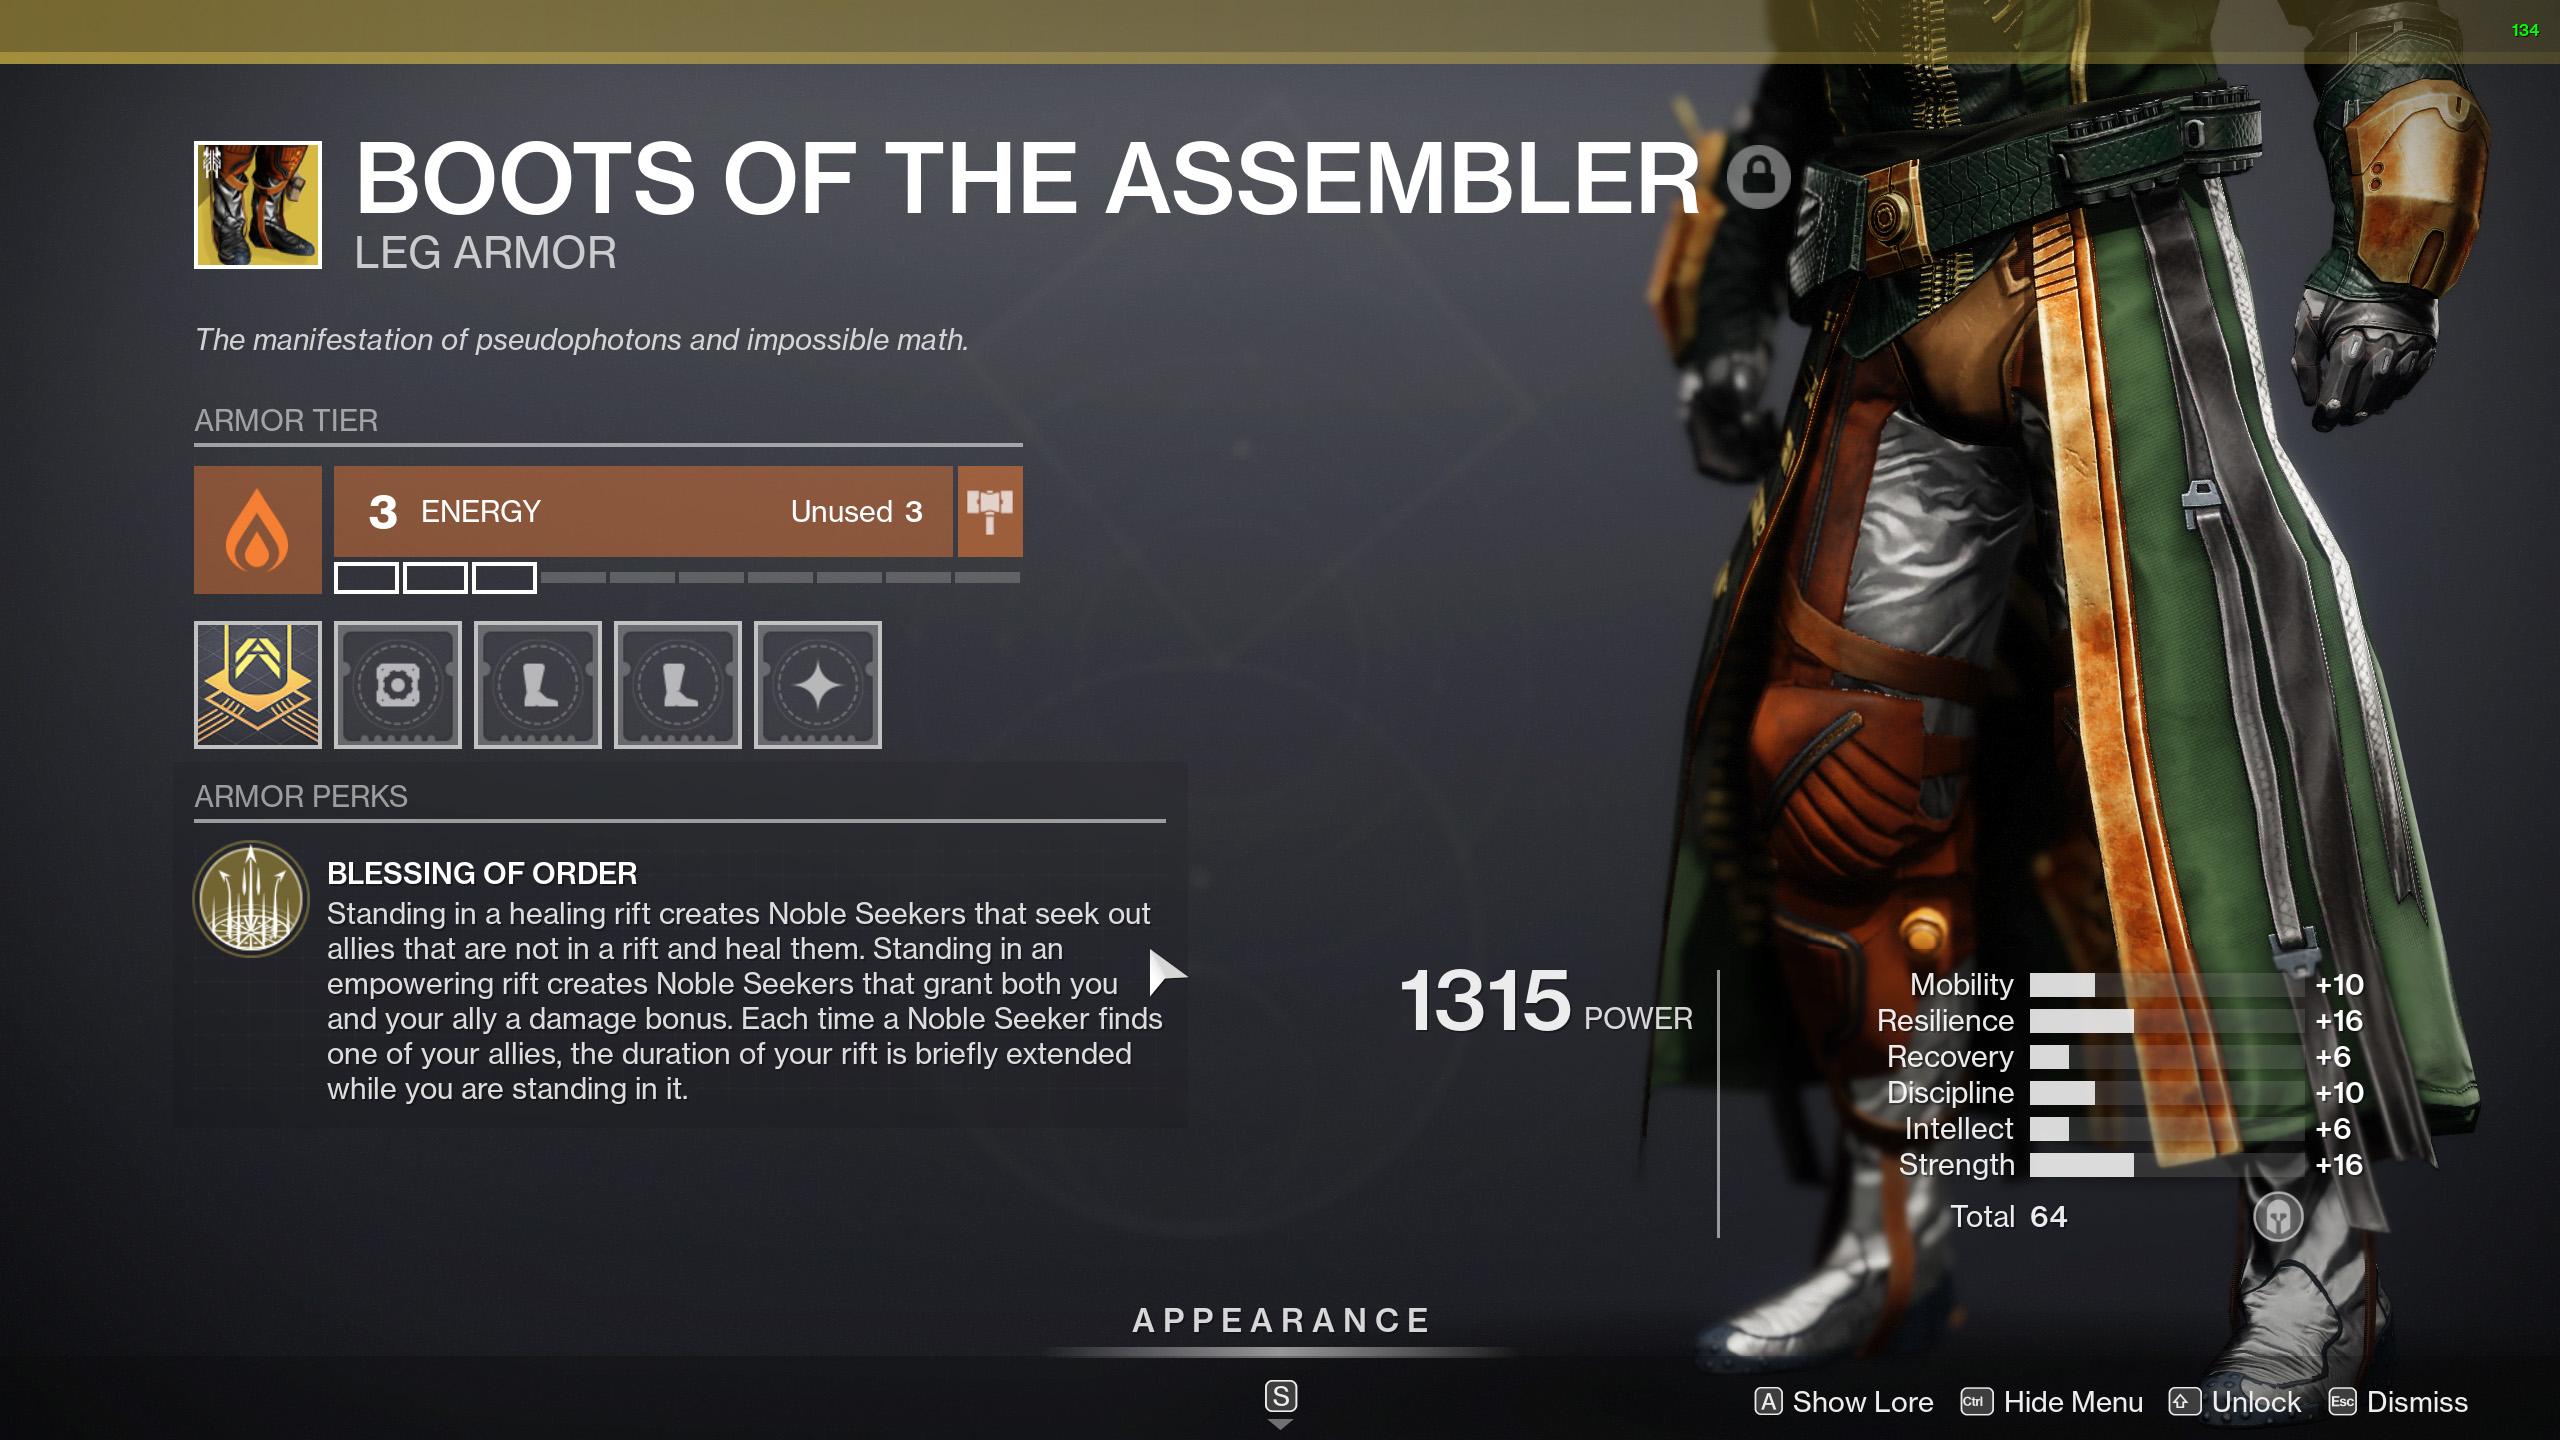 destiny 2 boots of the assembler